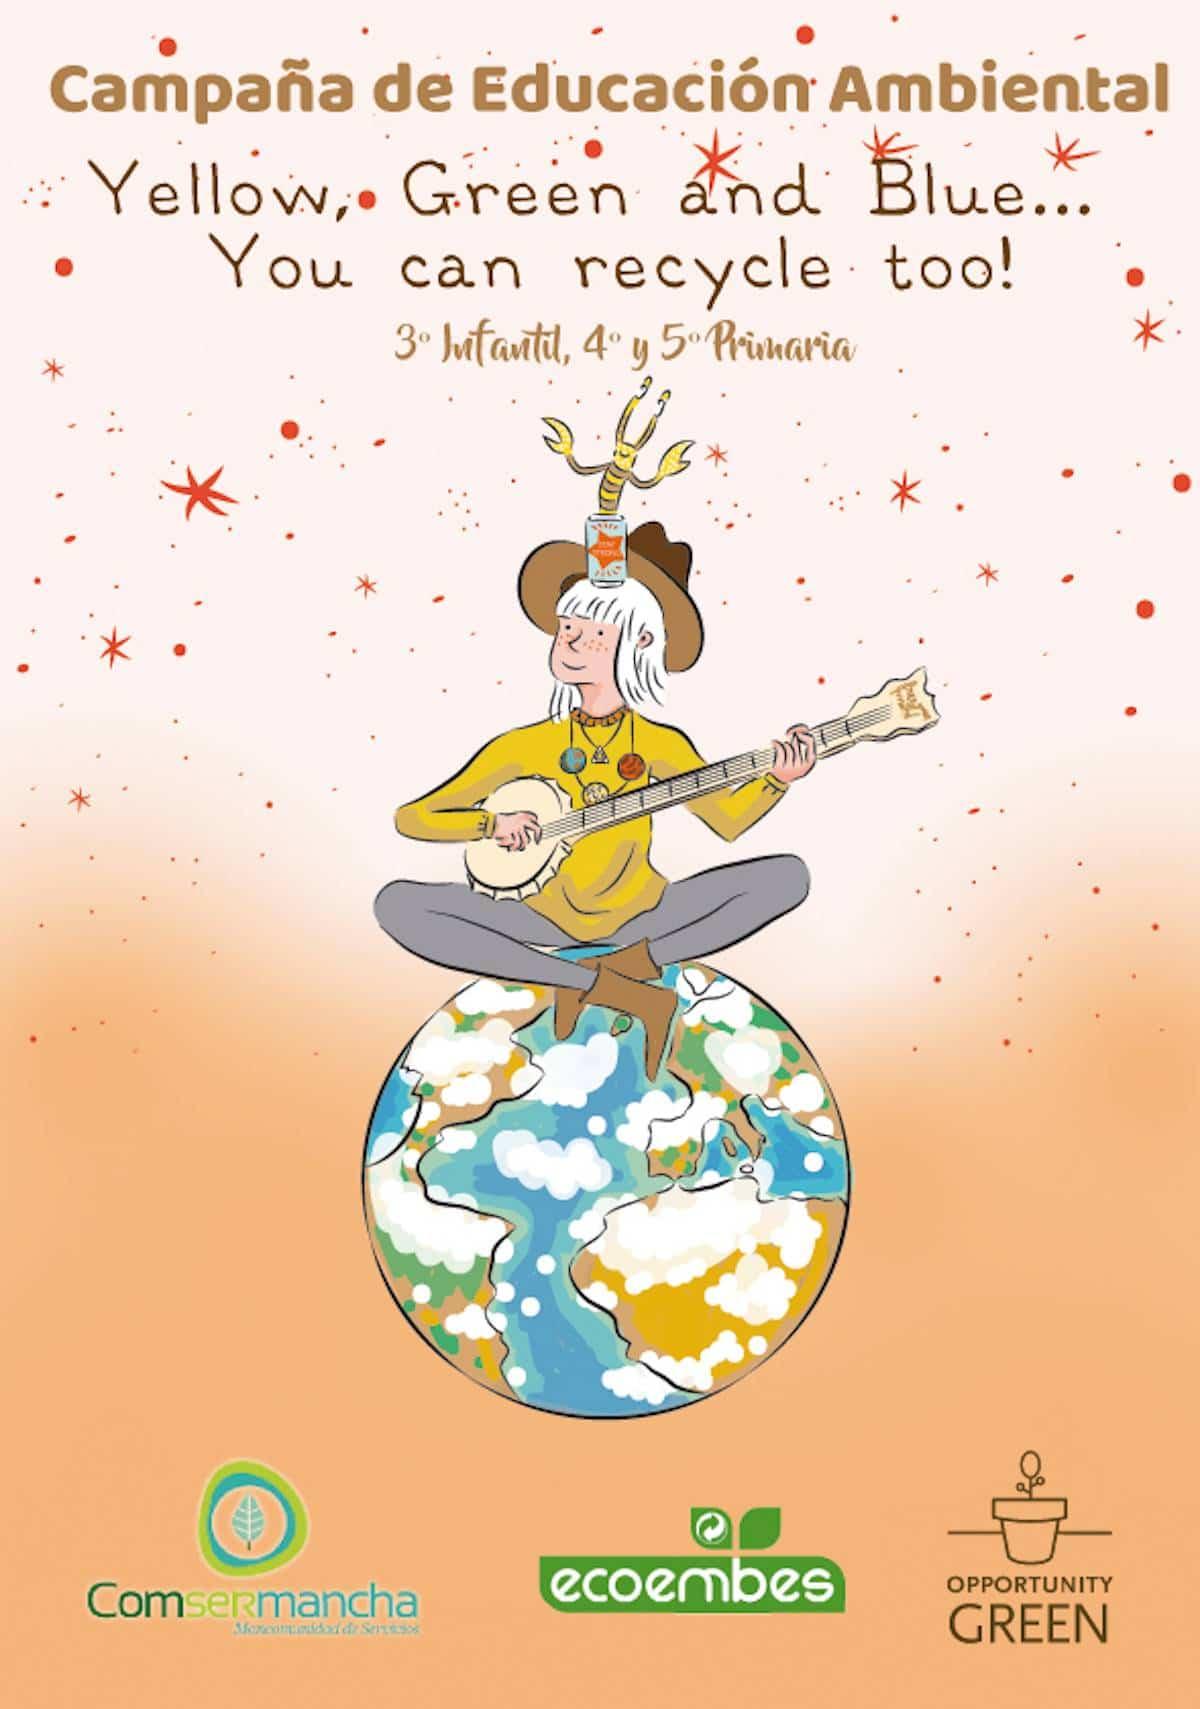 Campana Escolar reciclar en ingles Comsermancha - Comsermancha iniciará una Campaña escolar de reciclaje en inglés